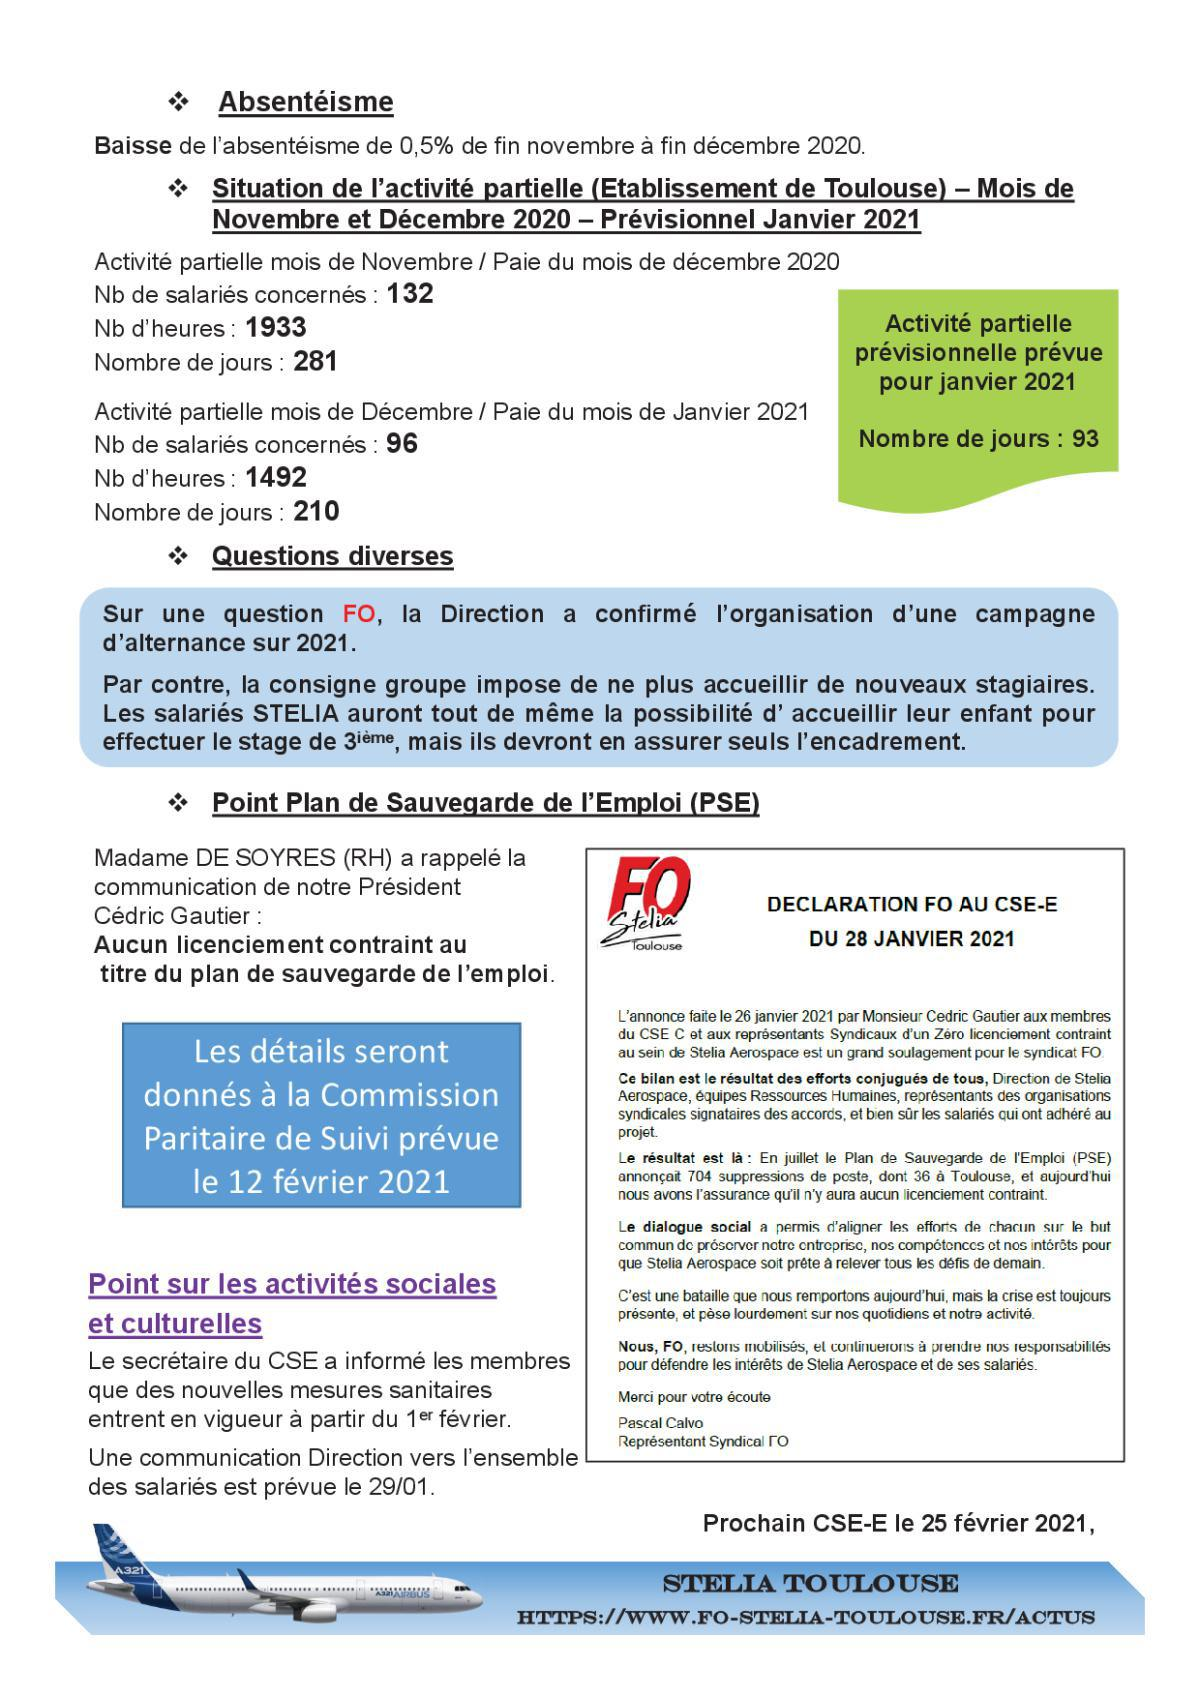 Compte rendu succinct CSE-E du 28 janvier 2021